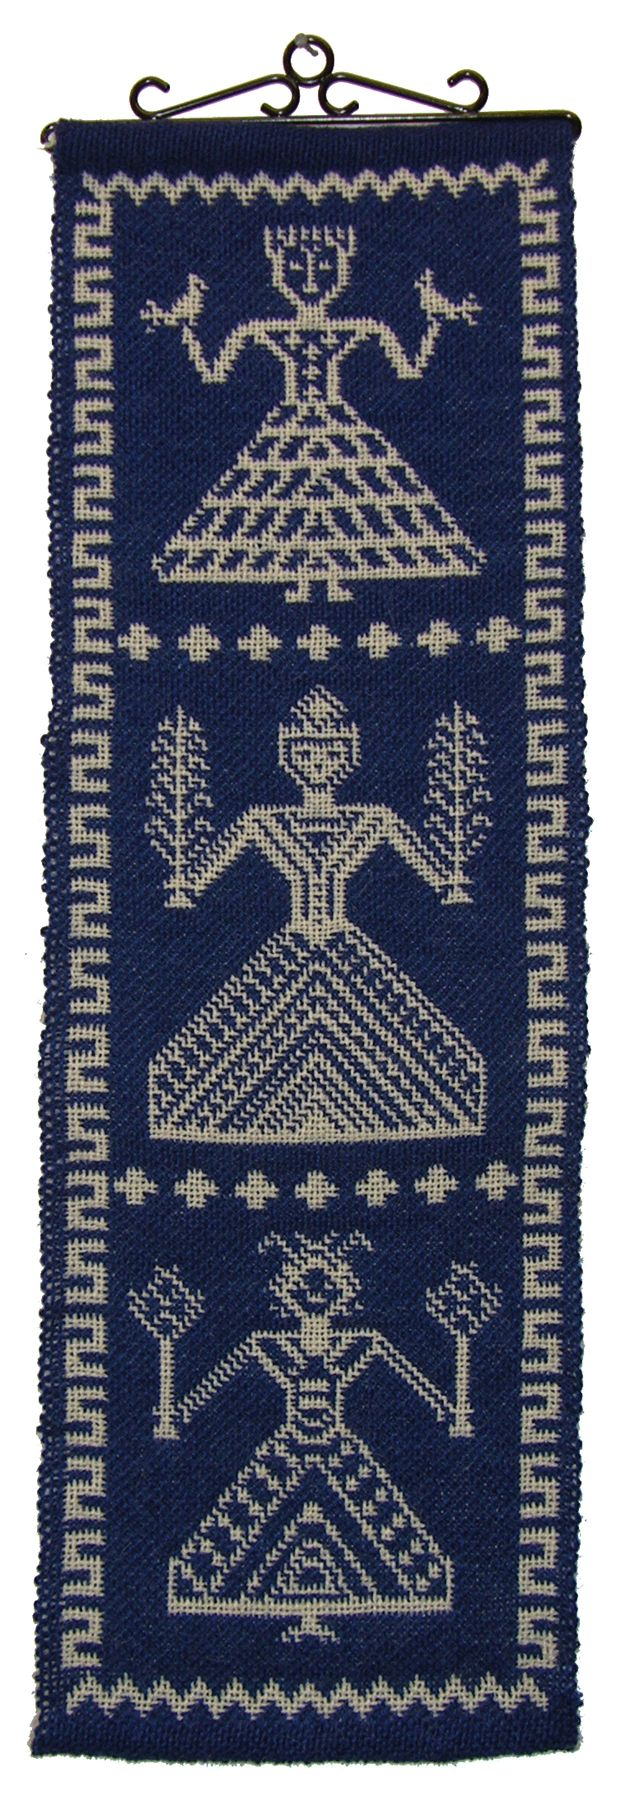 Images about cross stitch on pinterest stitching